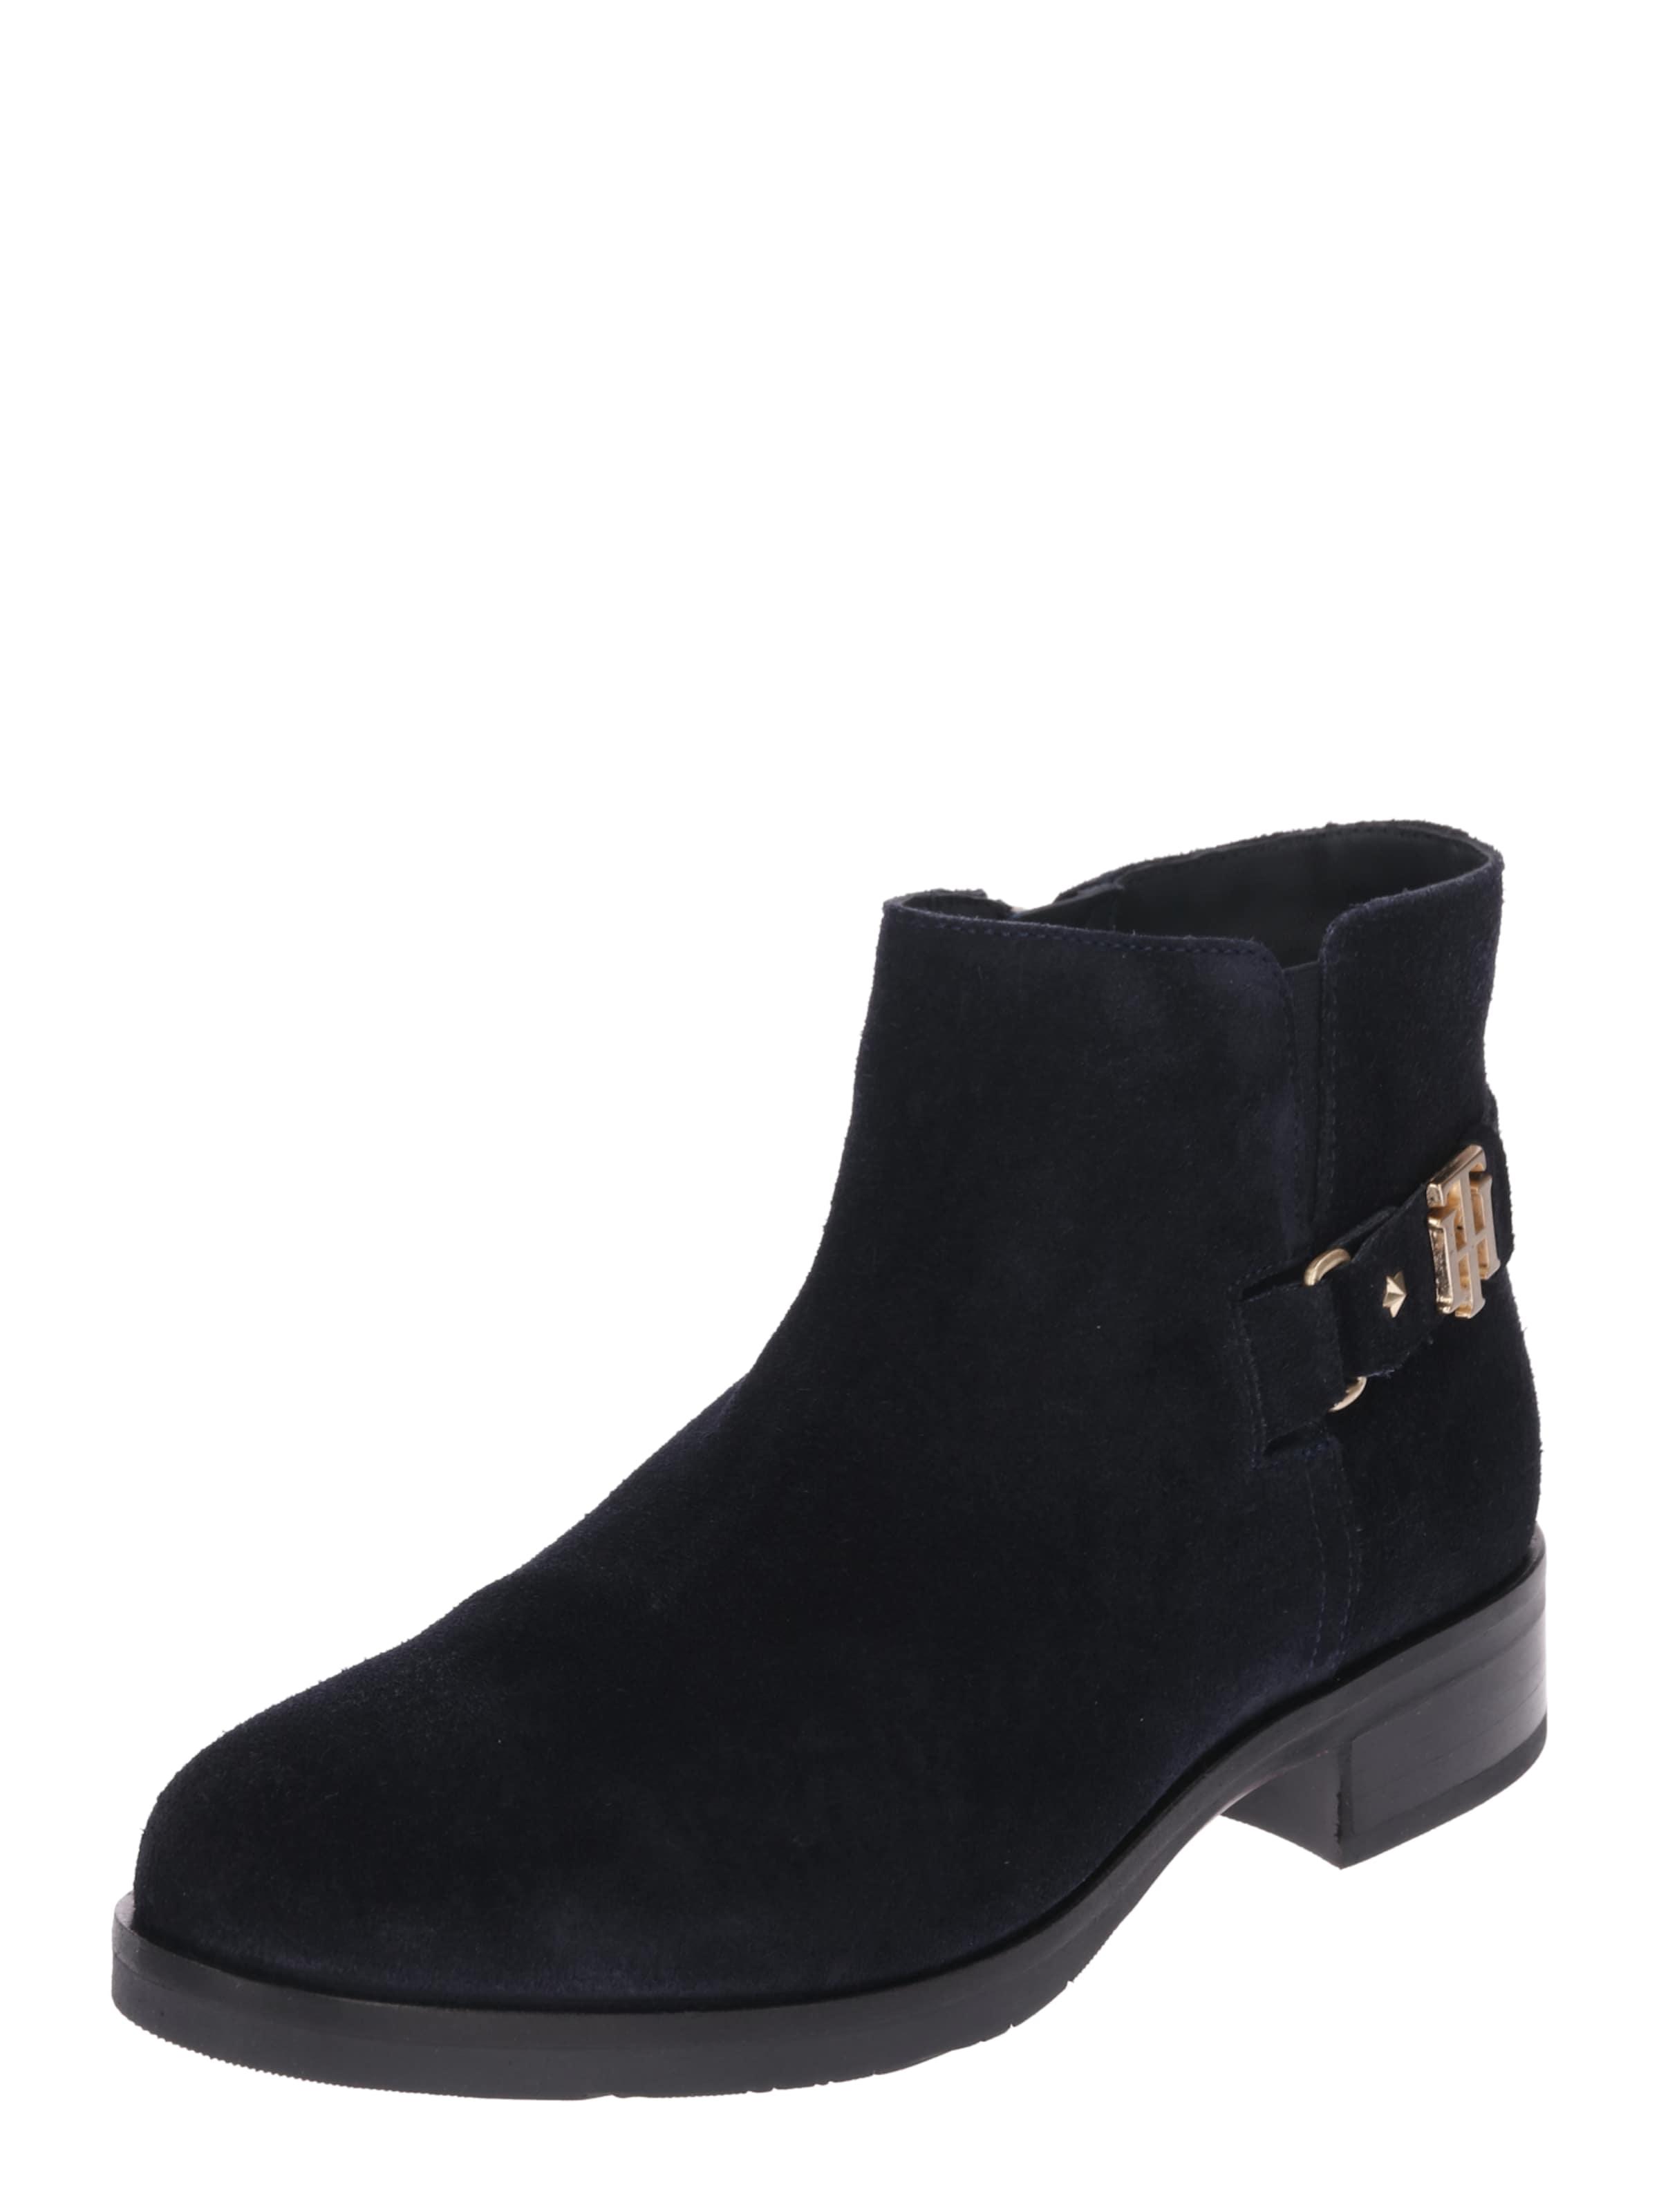 TOMMY HILFIGER Ankle-Boot Günstige und langlebige Schuhe